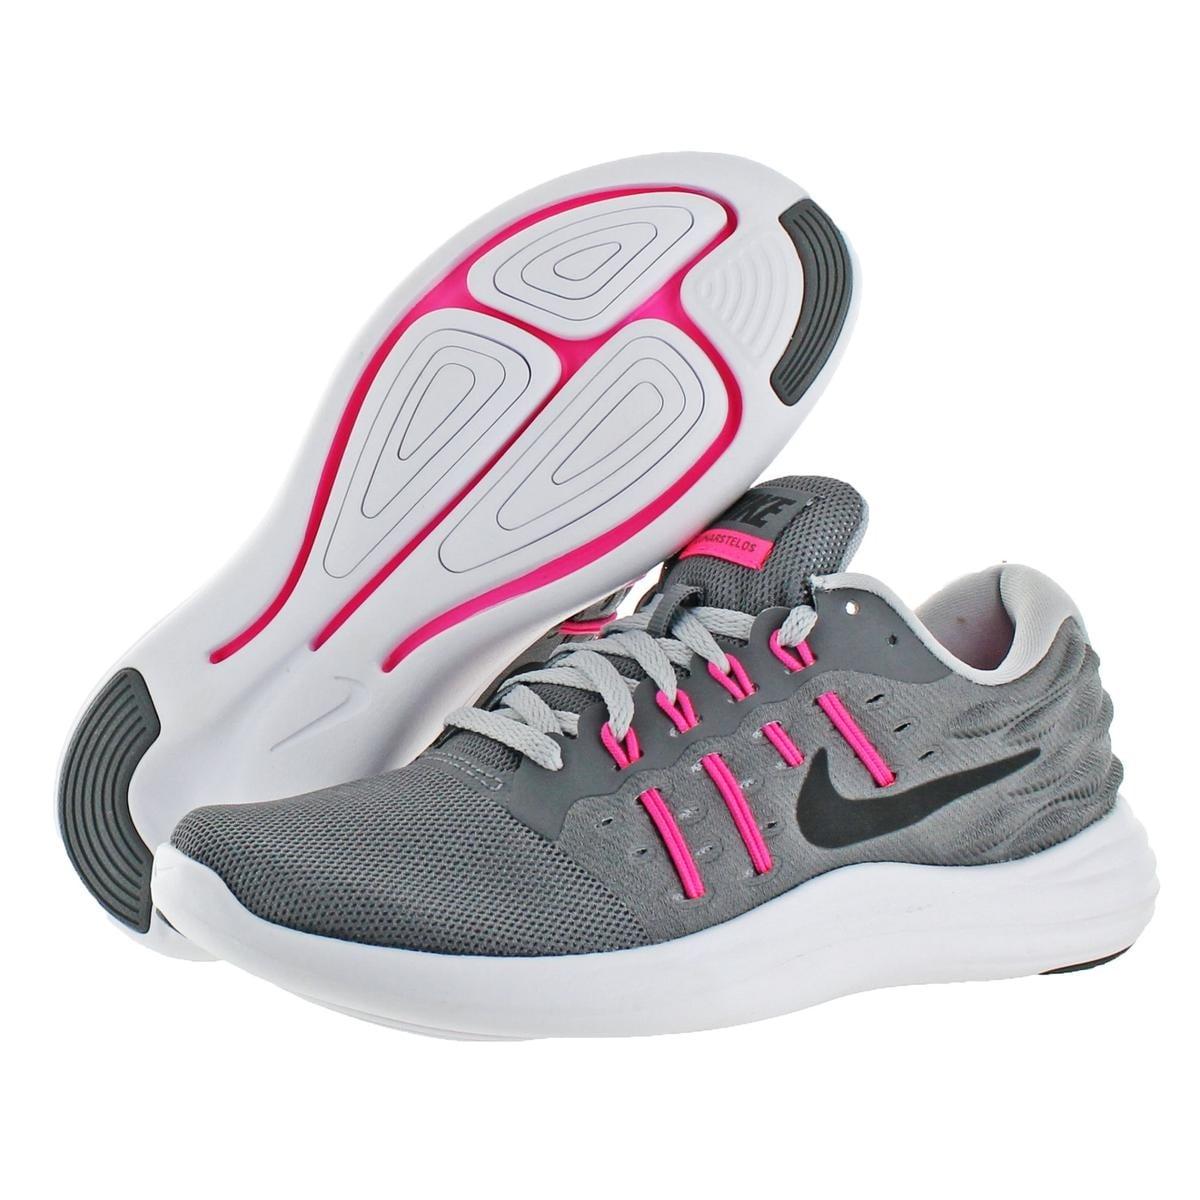 376d42b6940 Shop Nike Womens Lunarstelos Running Shoes Fitsole Lightweight - Free  Shipping Today - Overstock - 21942267